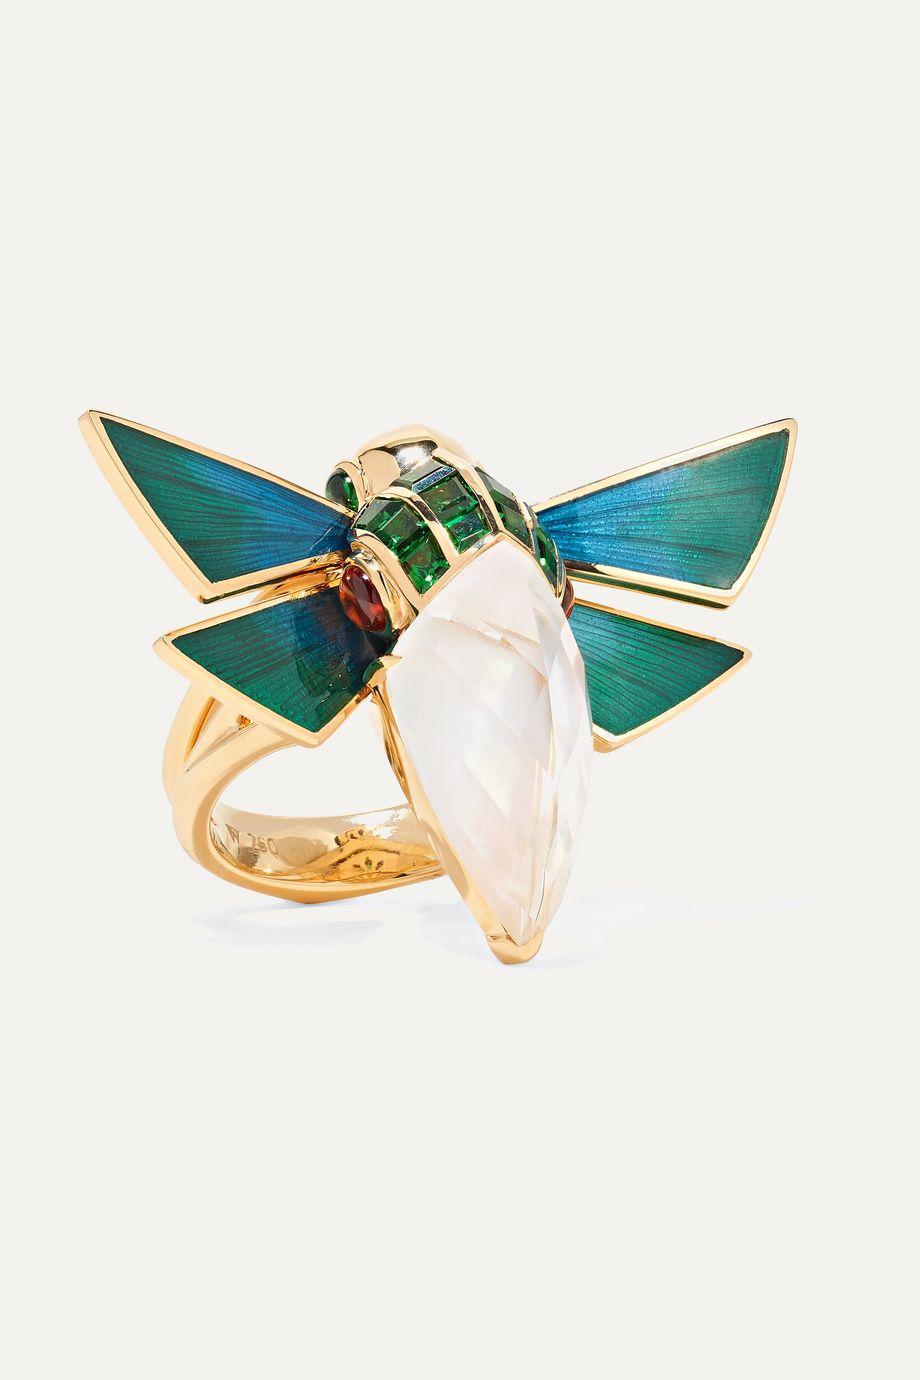 Stephen Webster Cuckoo Bee 18-karat gold multi-stone ring